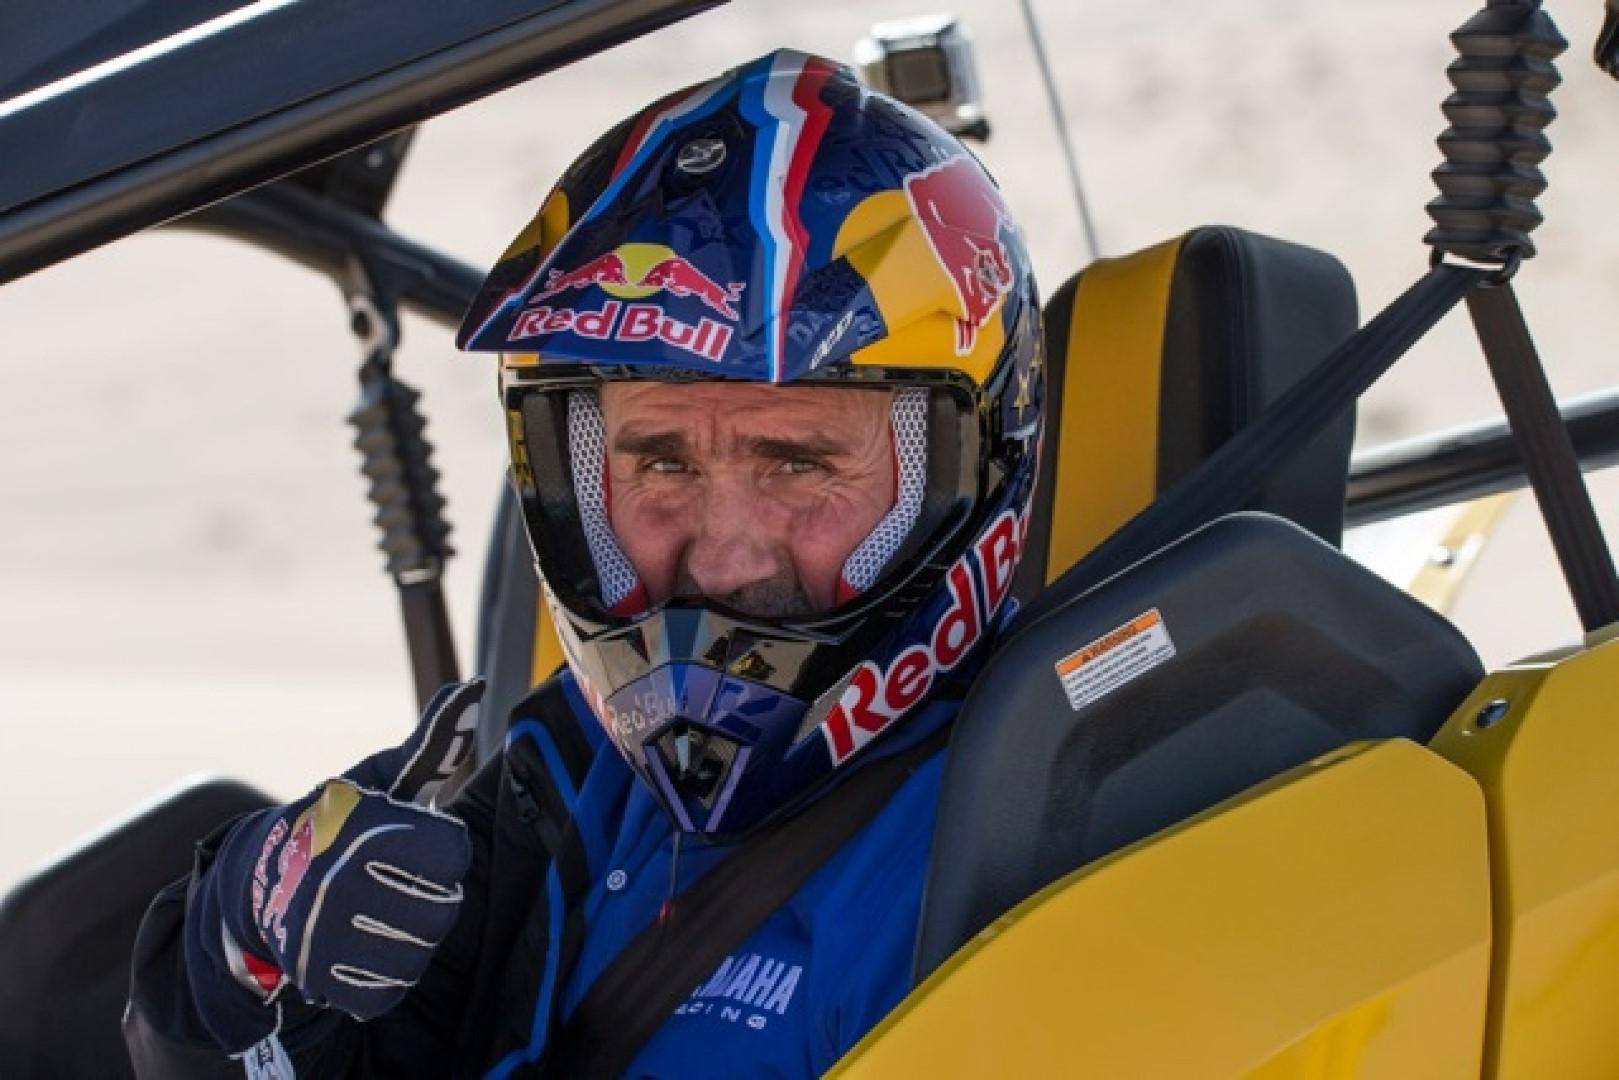 Stéphane Peterhansel  participera au Rallye du Bandama 2018